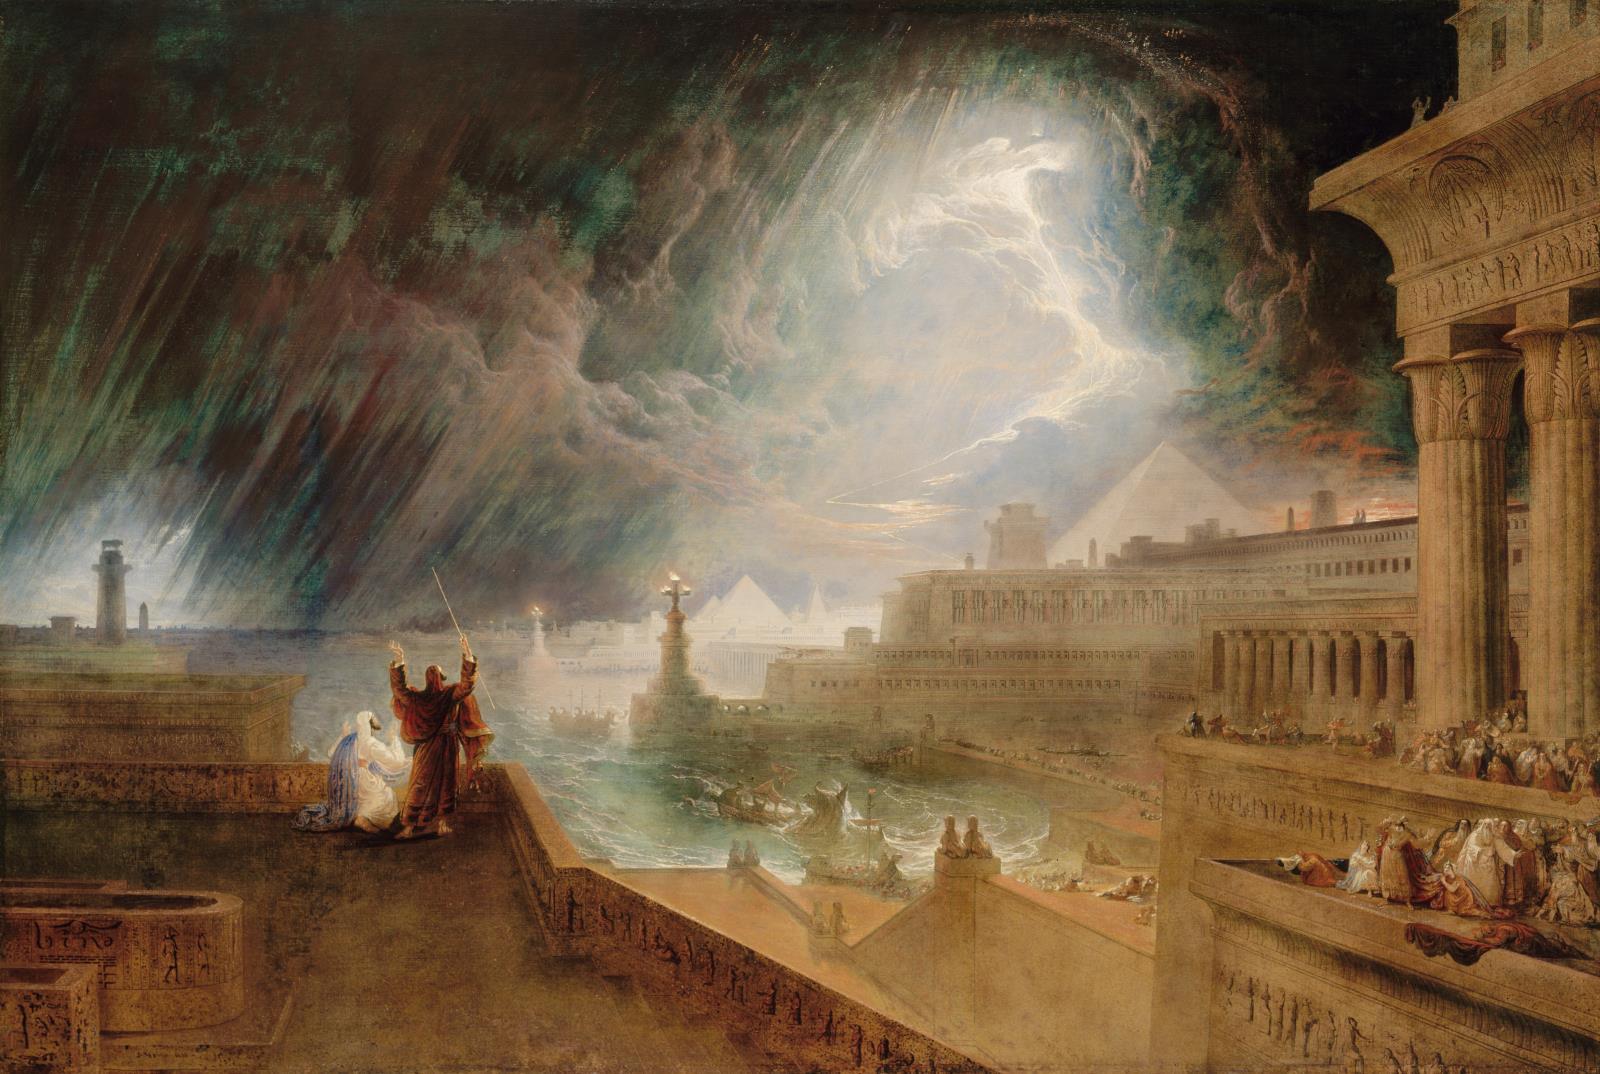 File:Martin, John - The Seventh Plague - 1823.jpg